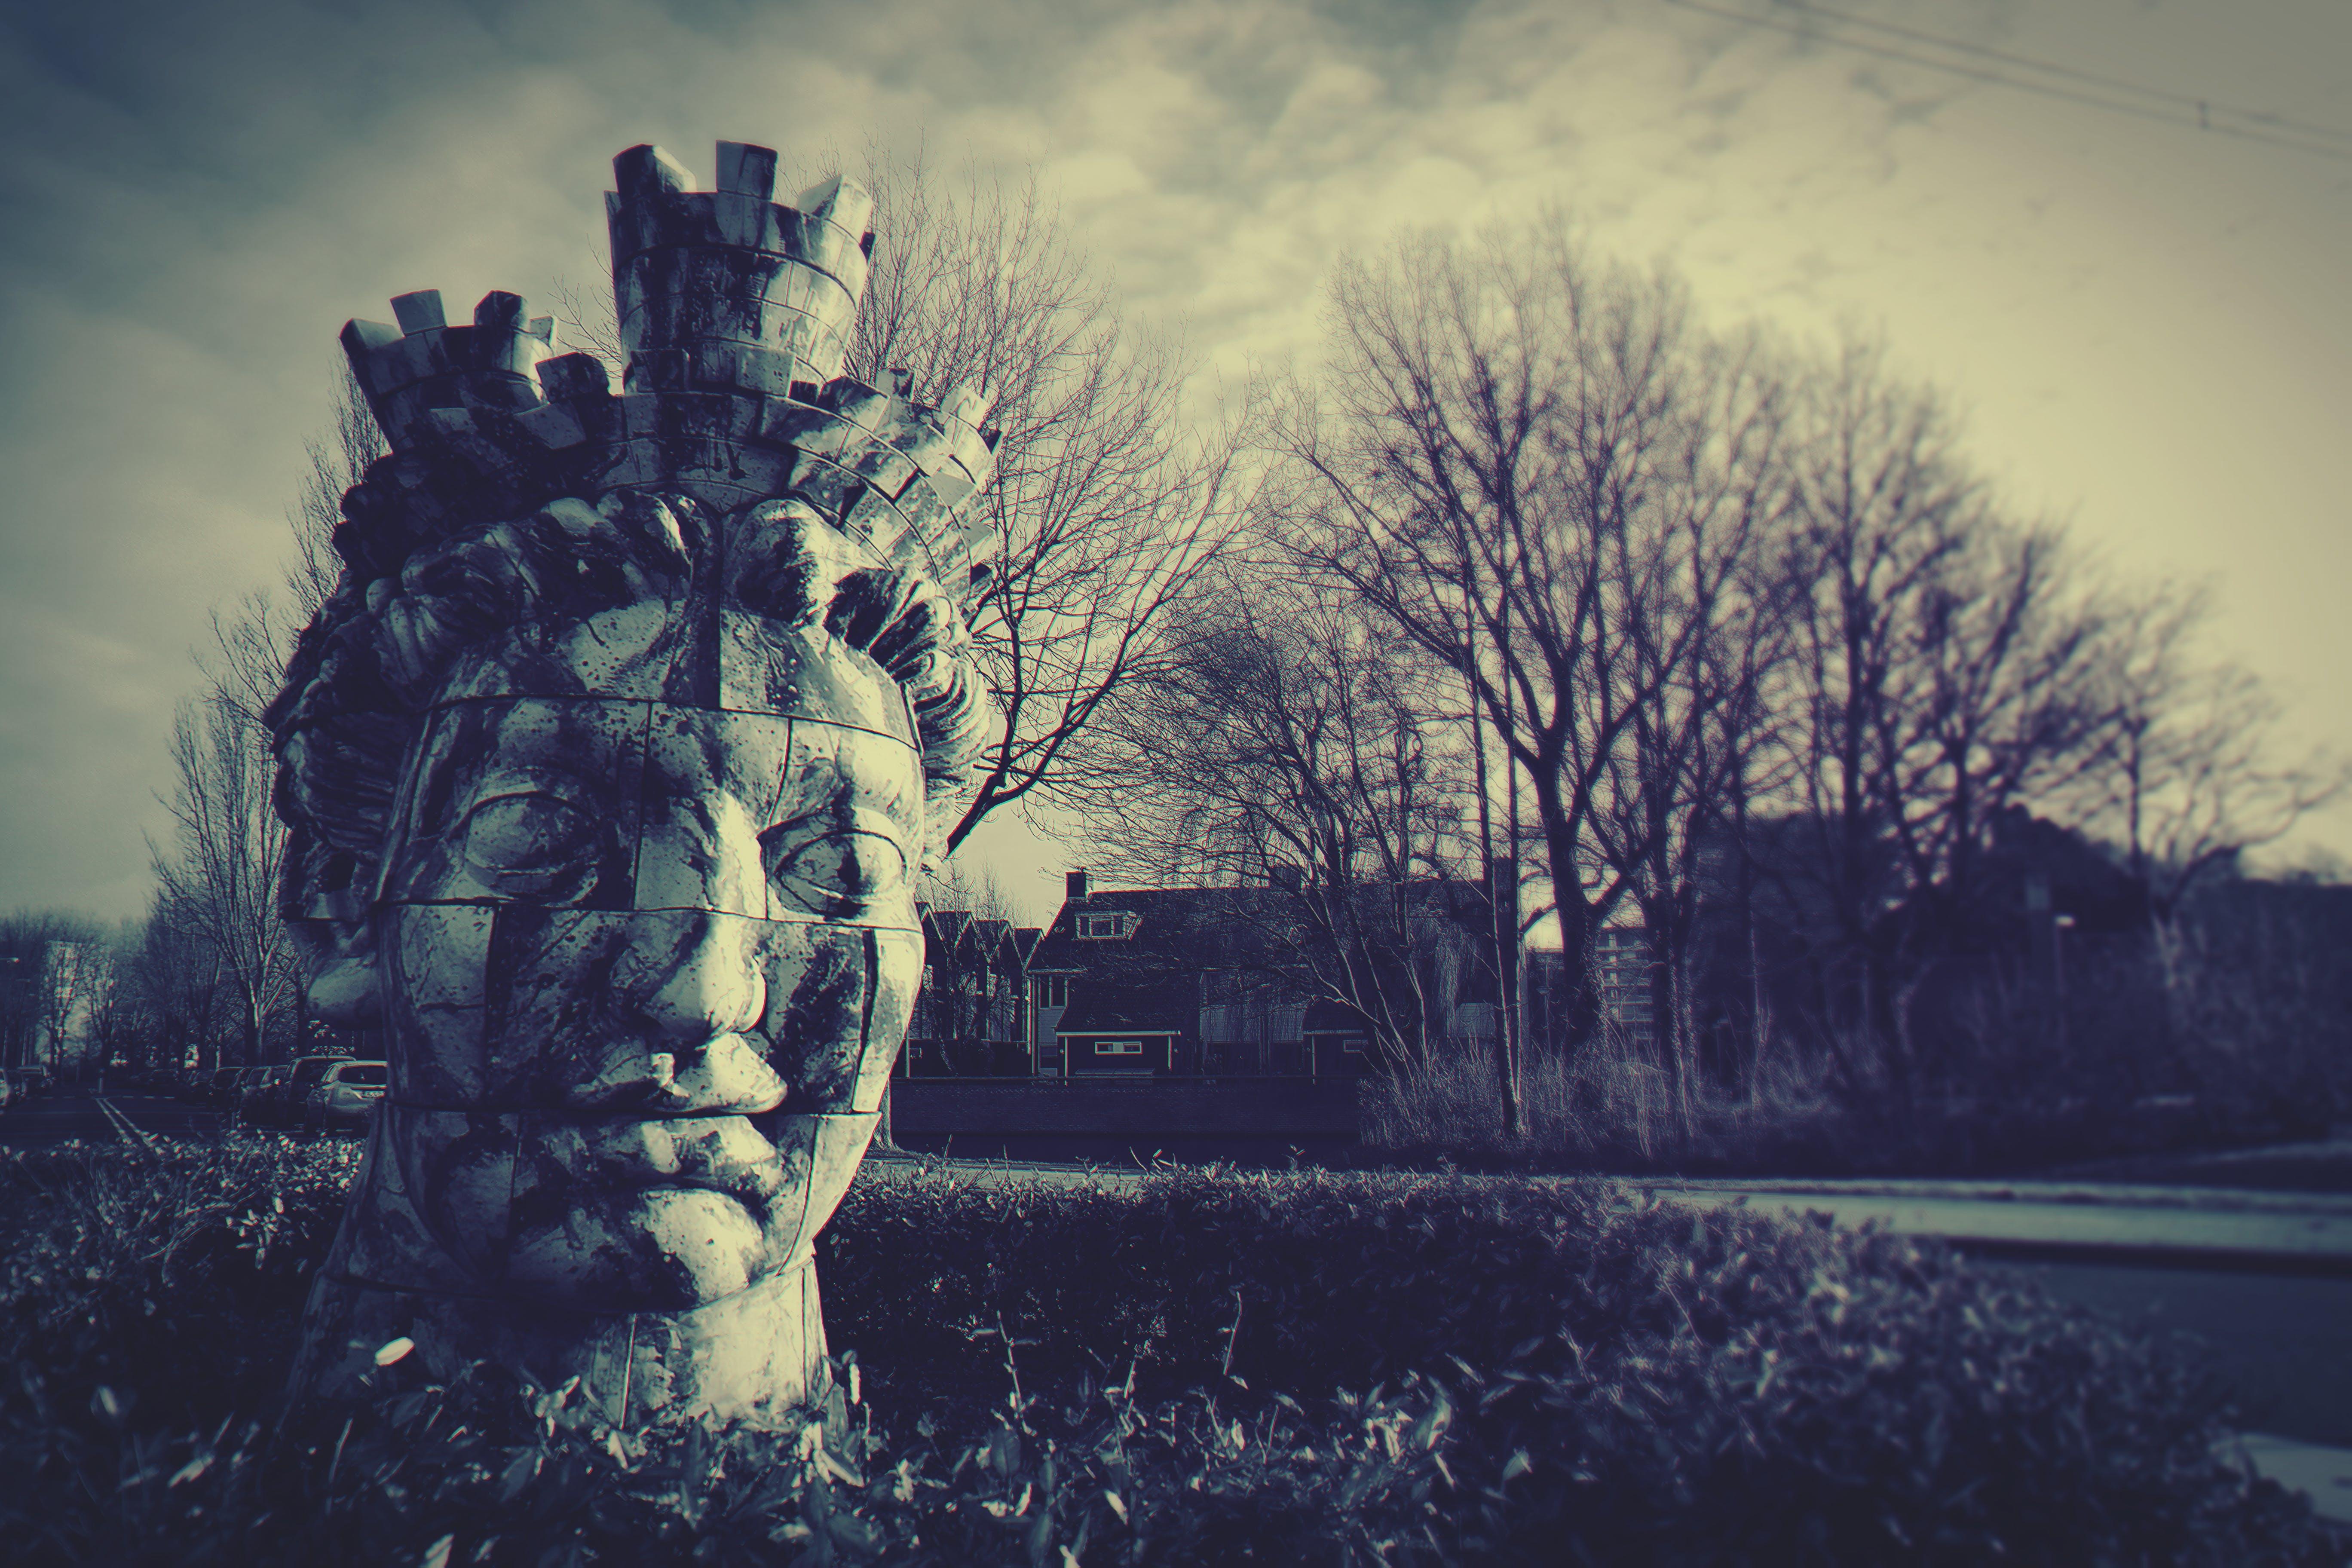 Human Head Statue Near Bare Trees